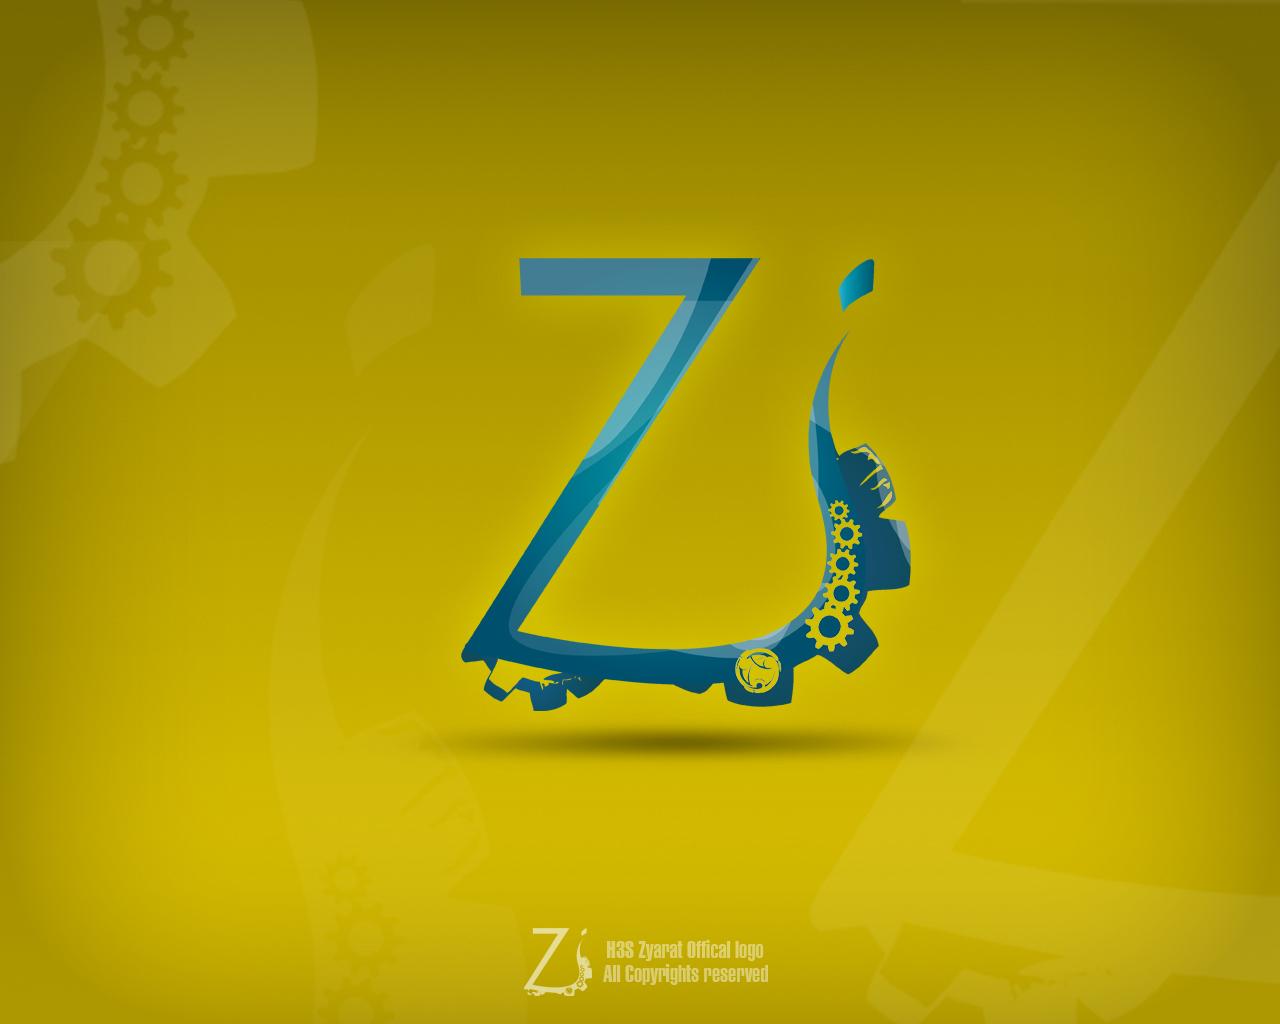 ZYARAT logo 2 by Eng-Sam